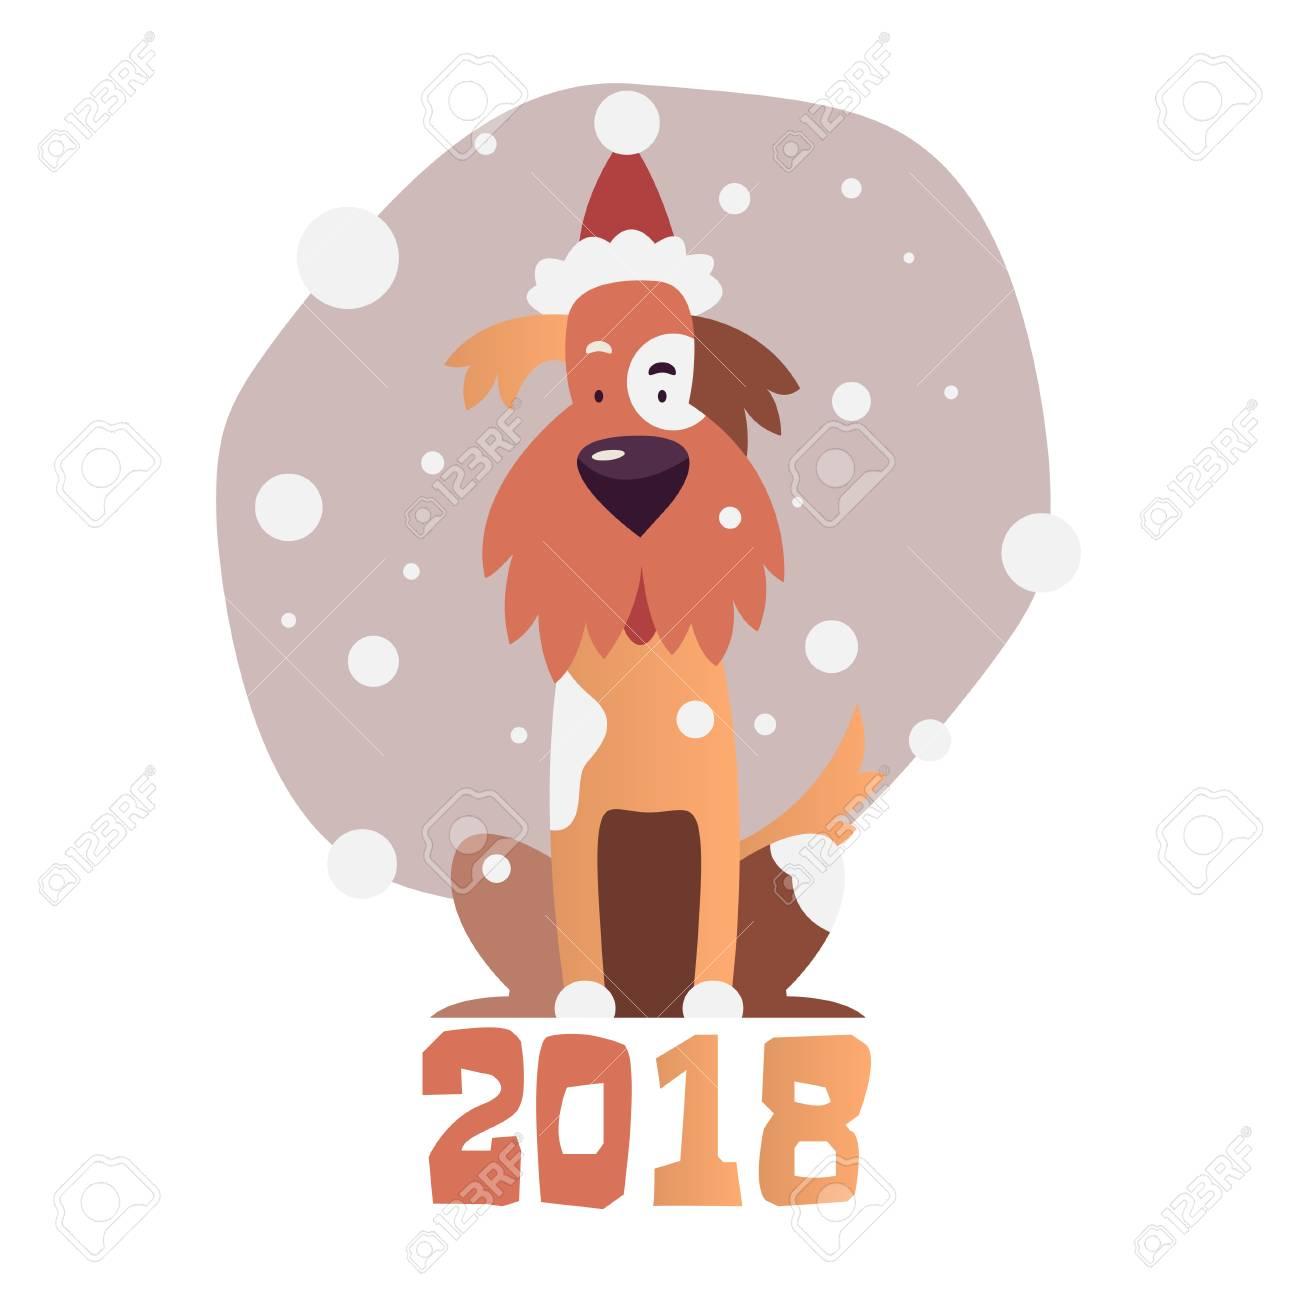 dessin animé pere noel 2018 Chien Jaune Symbole De La Nouvelle Année 2018. Chien De Dessin  dessin animé pere noel 2018